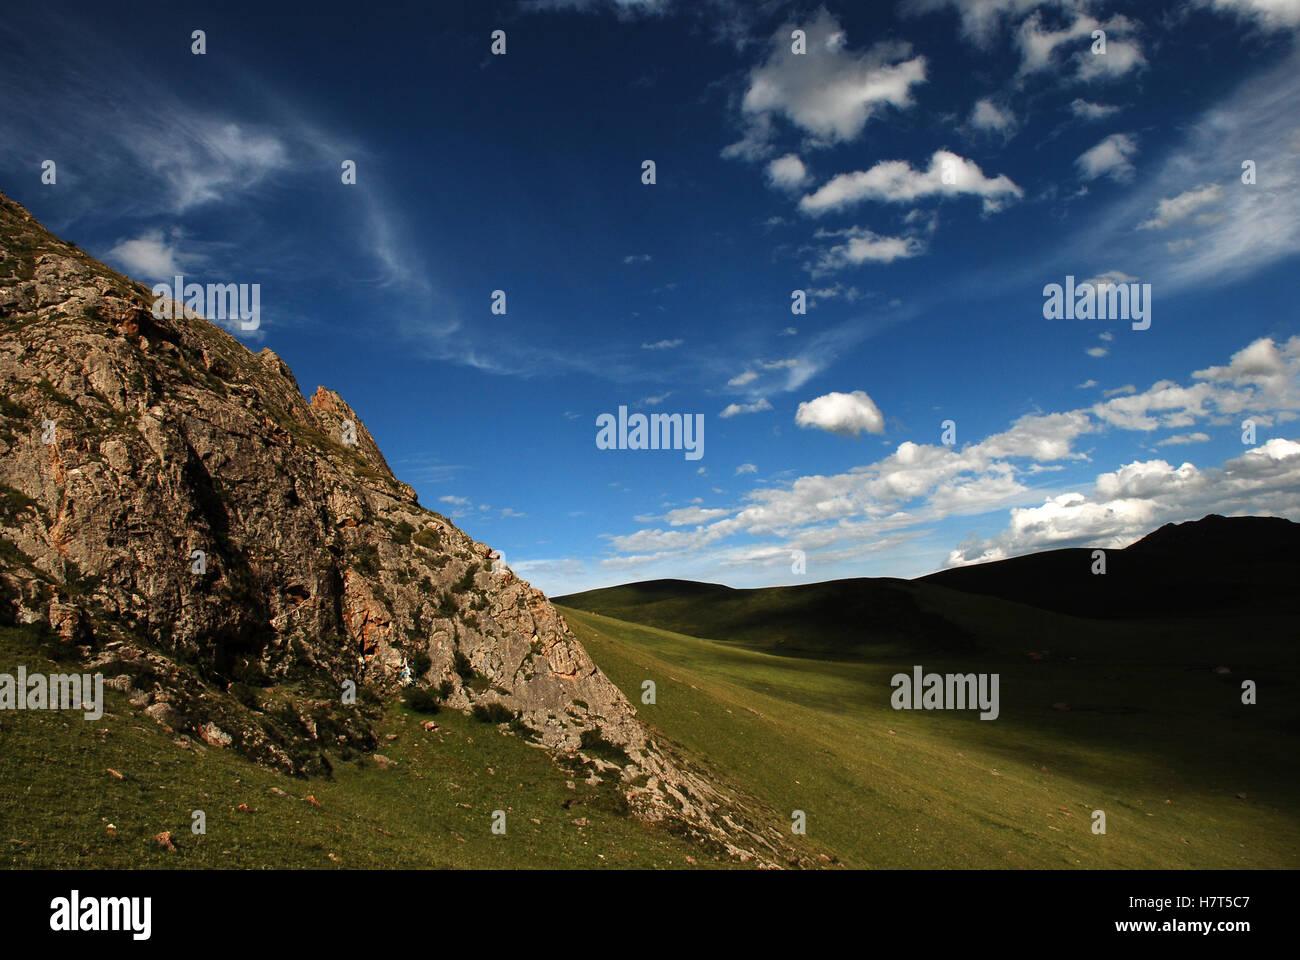 Mountain in Tibet - Stock Image